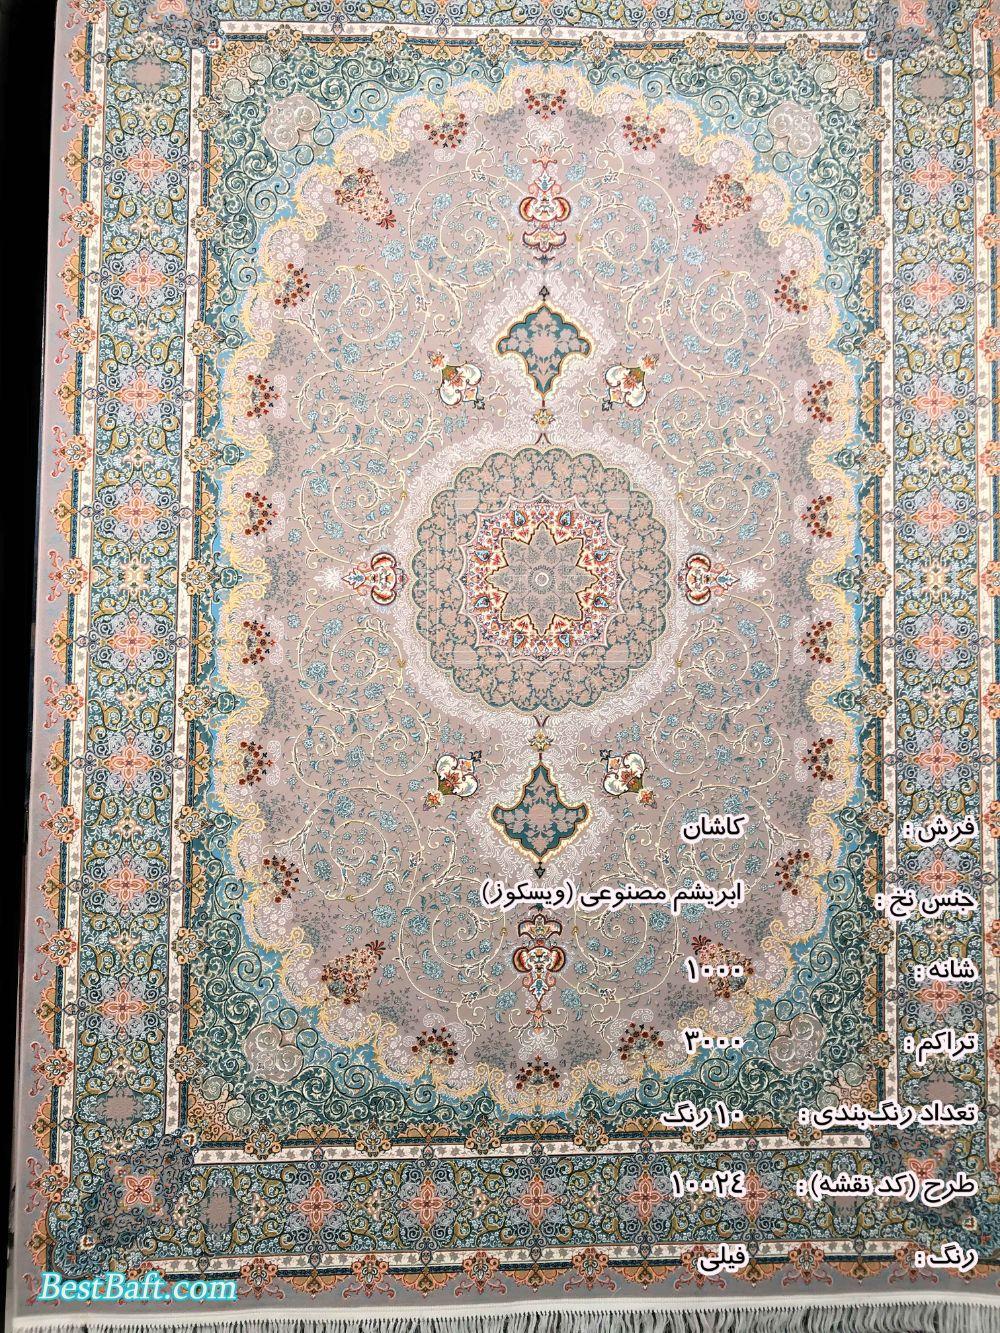 مشخصات، قیمت و خرید فرش کاشان 1000 شانه فیلی کد 10024 ابریشم مصنوعی